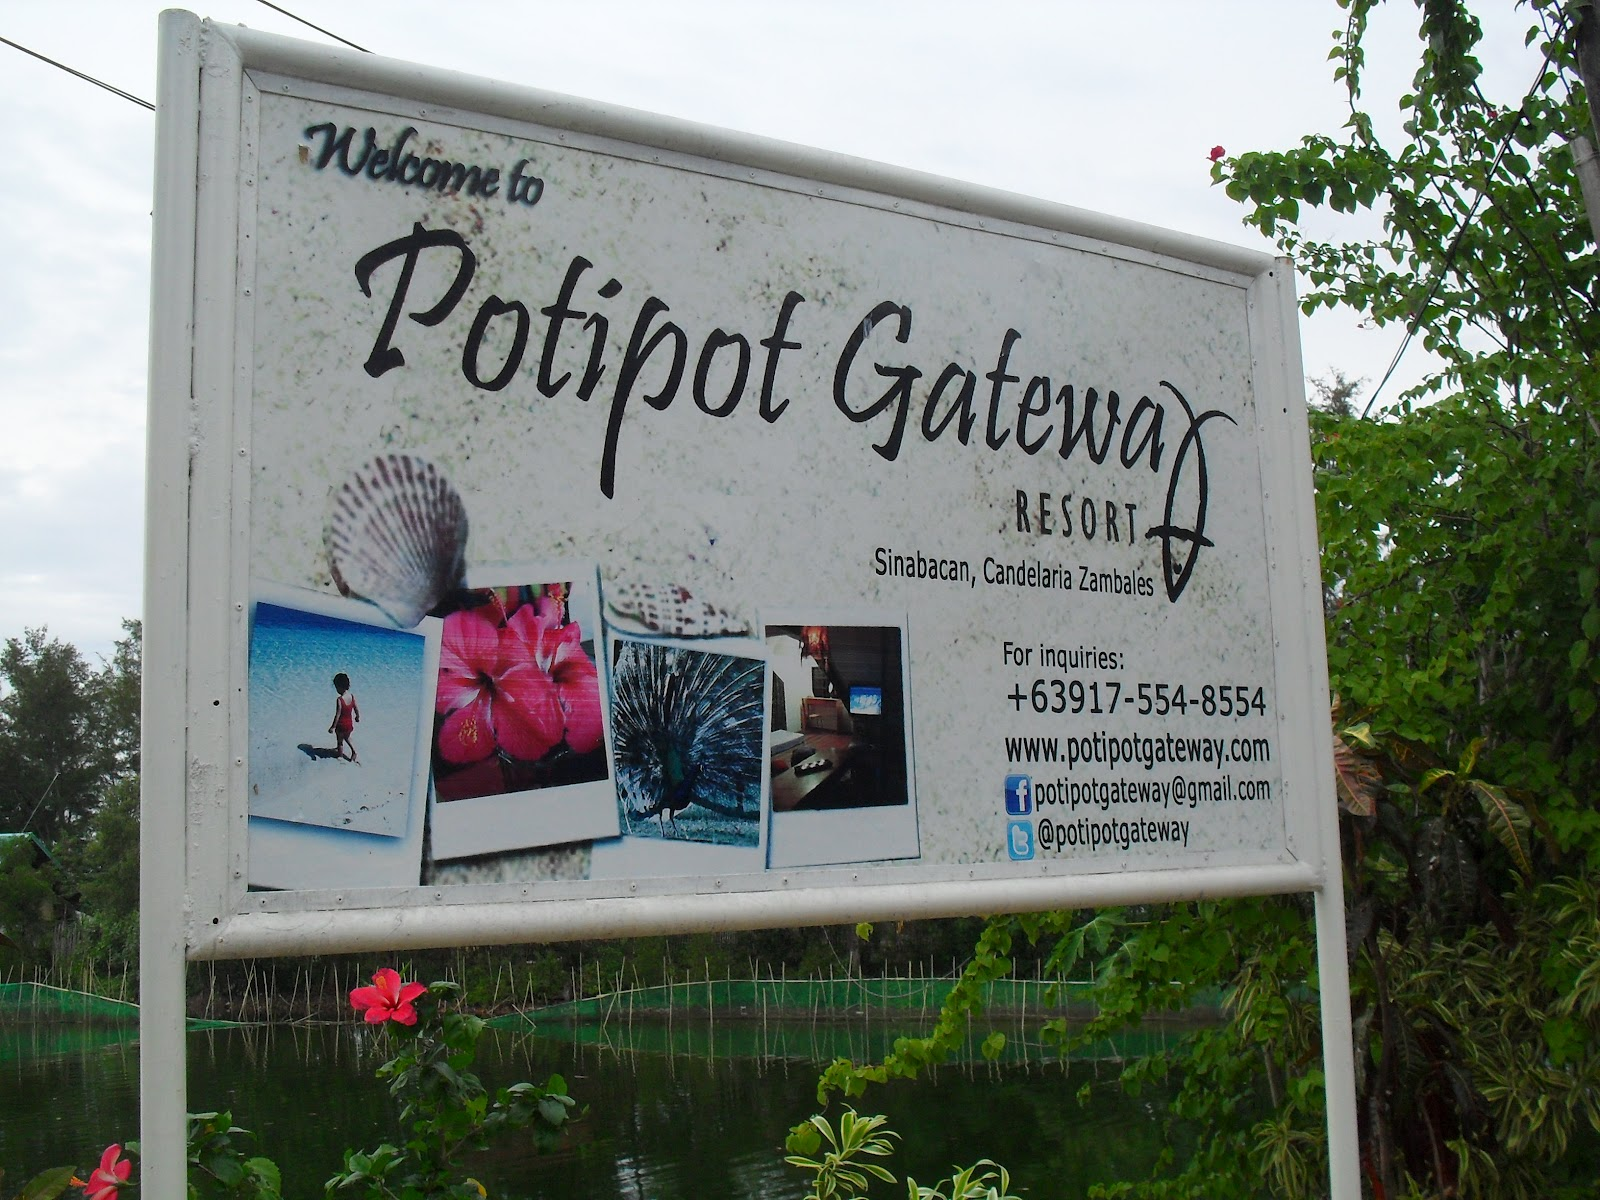 private massage gateway parramatta road